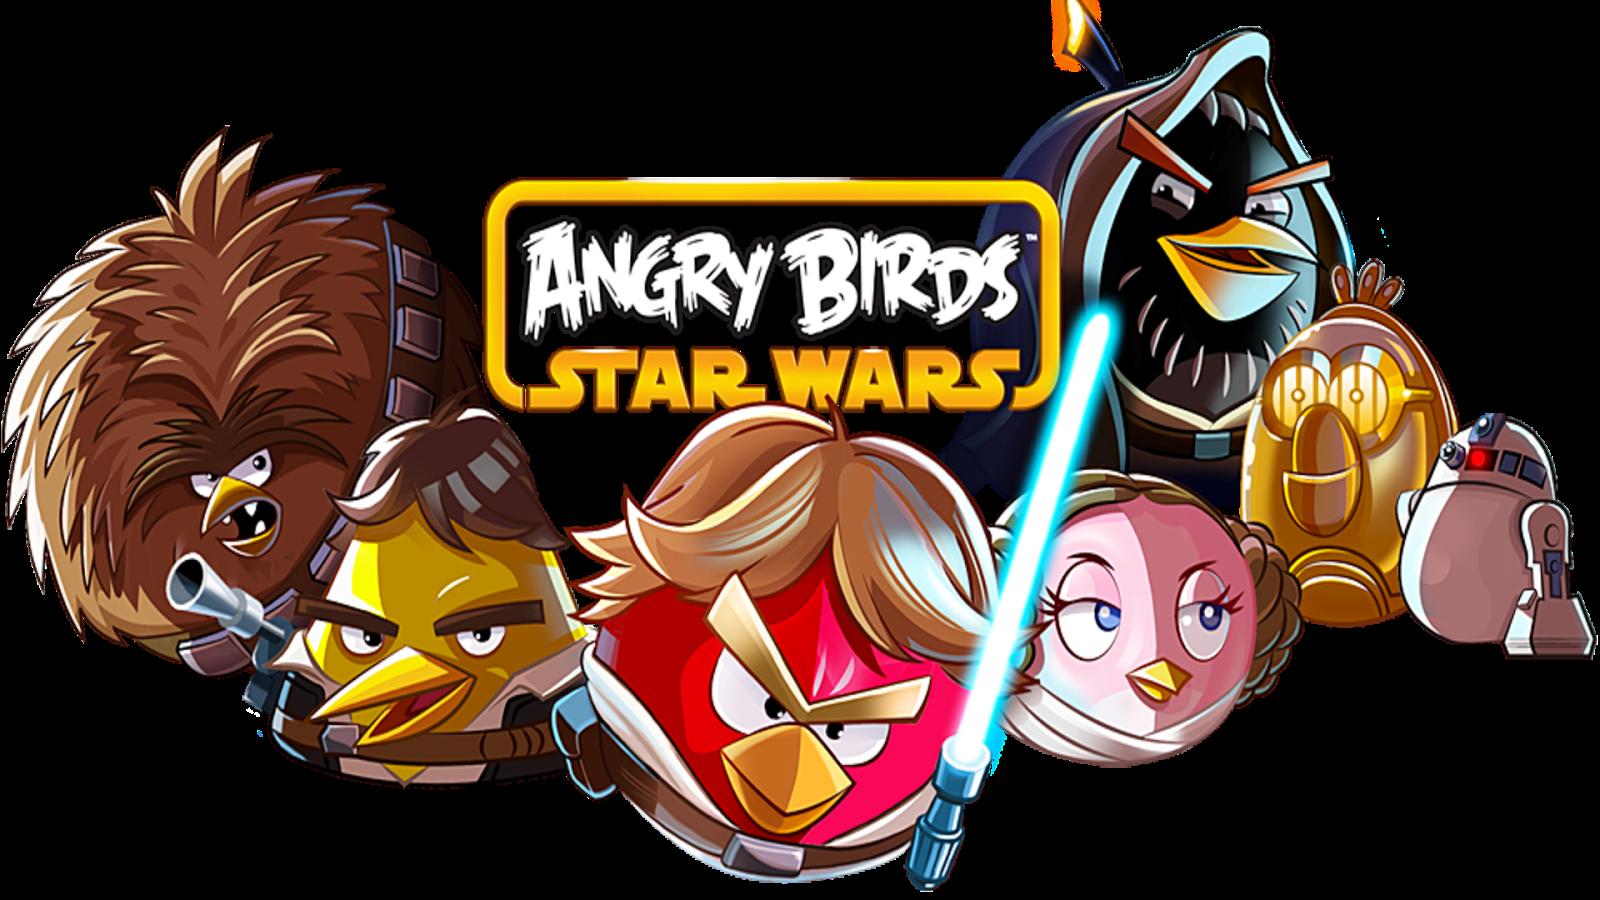 Gambar mewarnai angry birds star wars mewarnai gambar - Angry birds star wars 8 ...